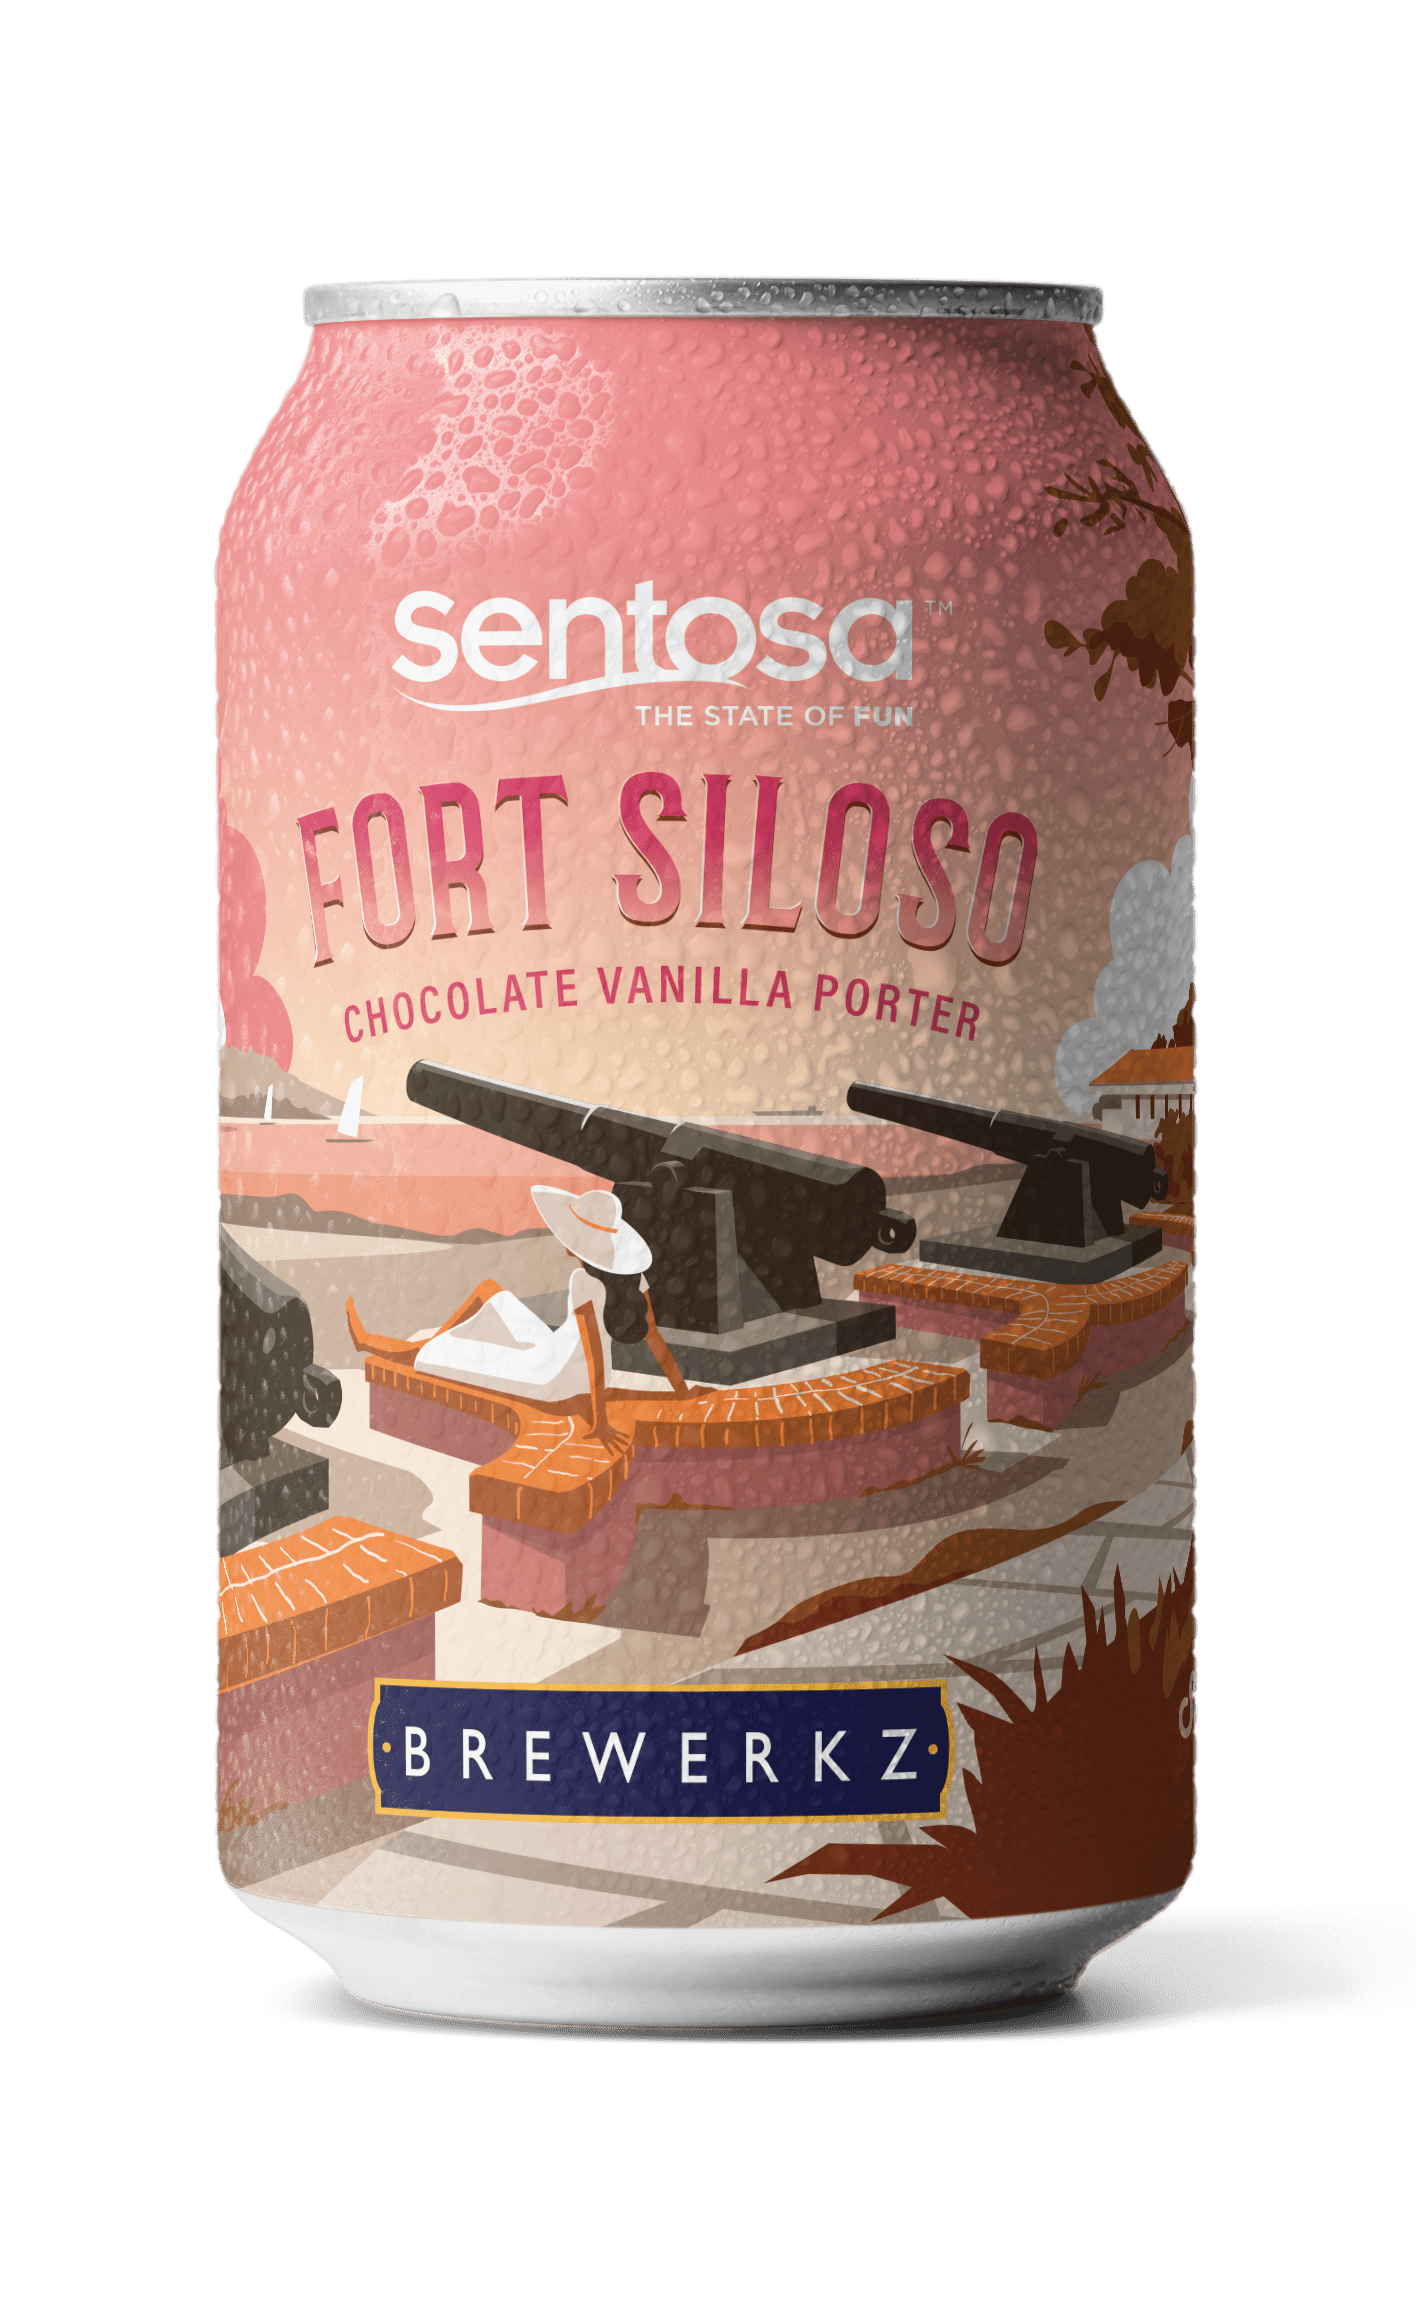 Fort Siloso Chocolate Vanilla Porter